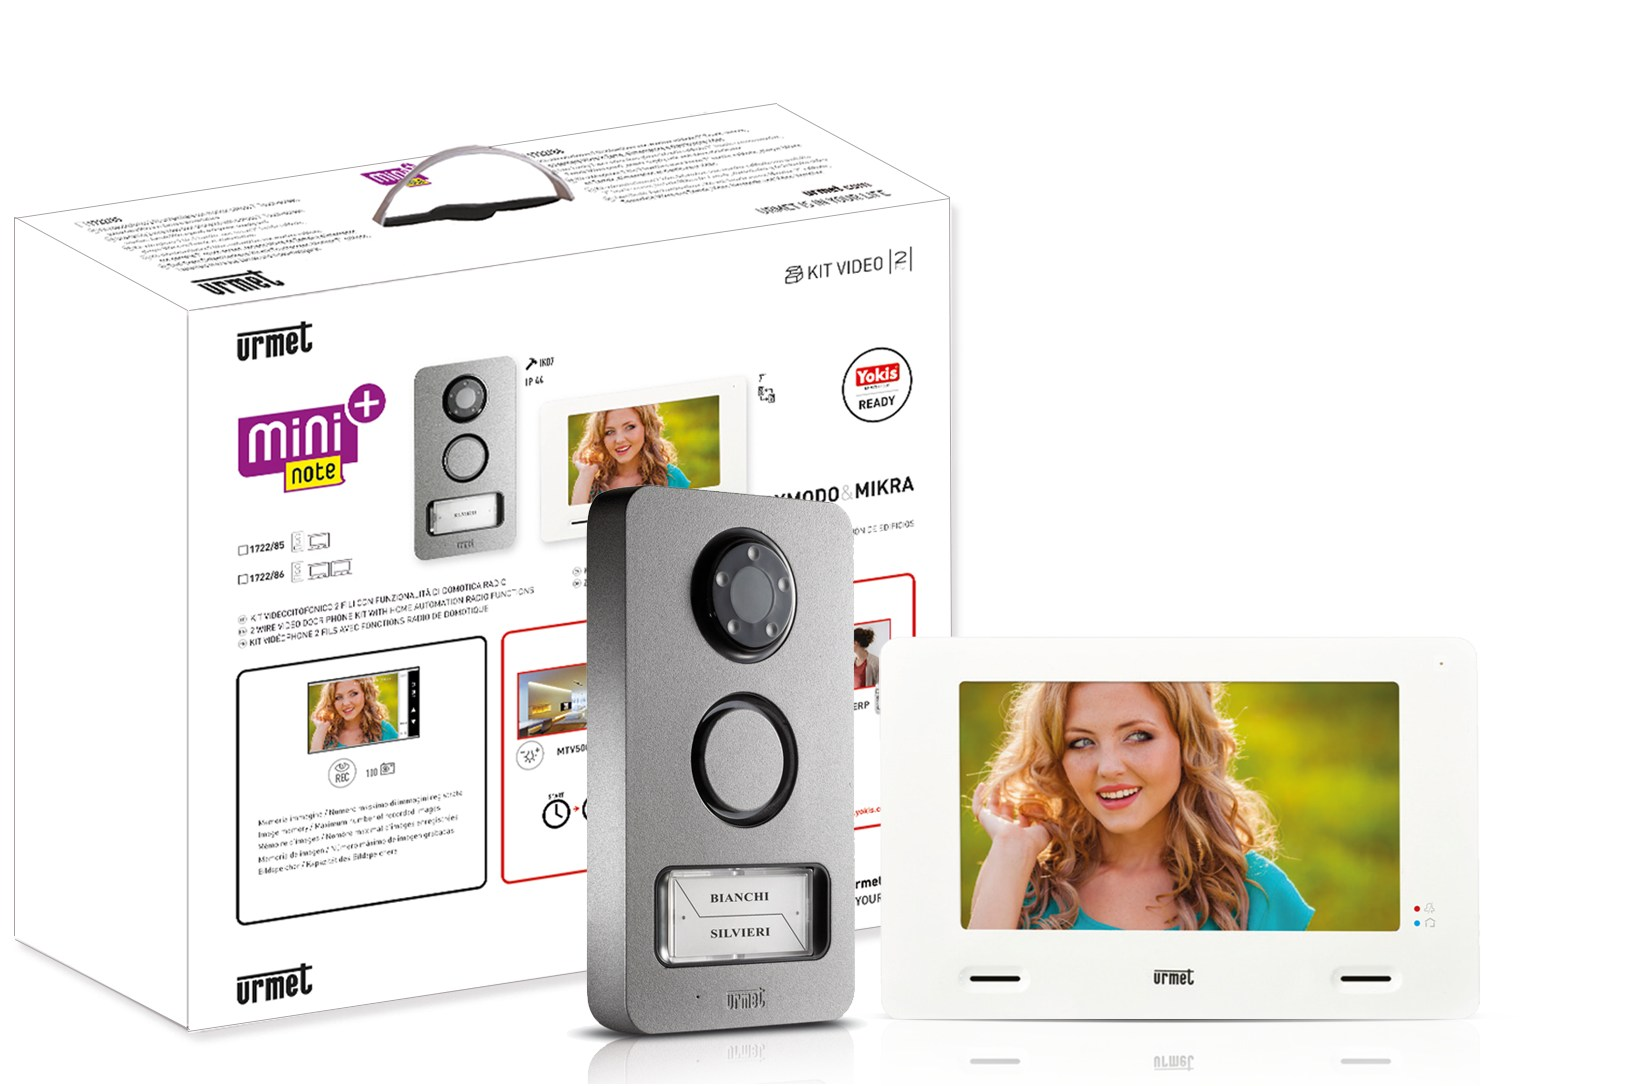 Kit videocitofonico mini note by urmet - Interphone video urmet ...